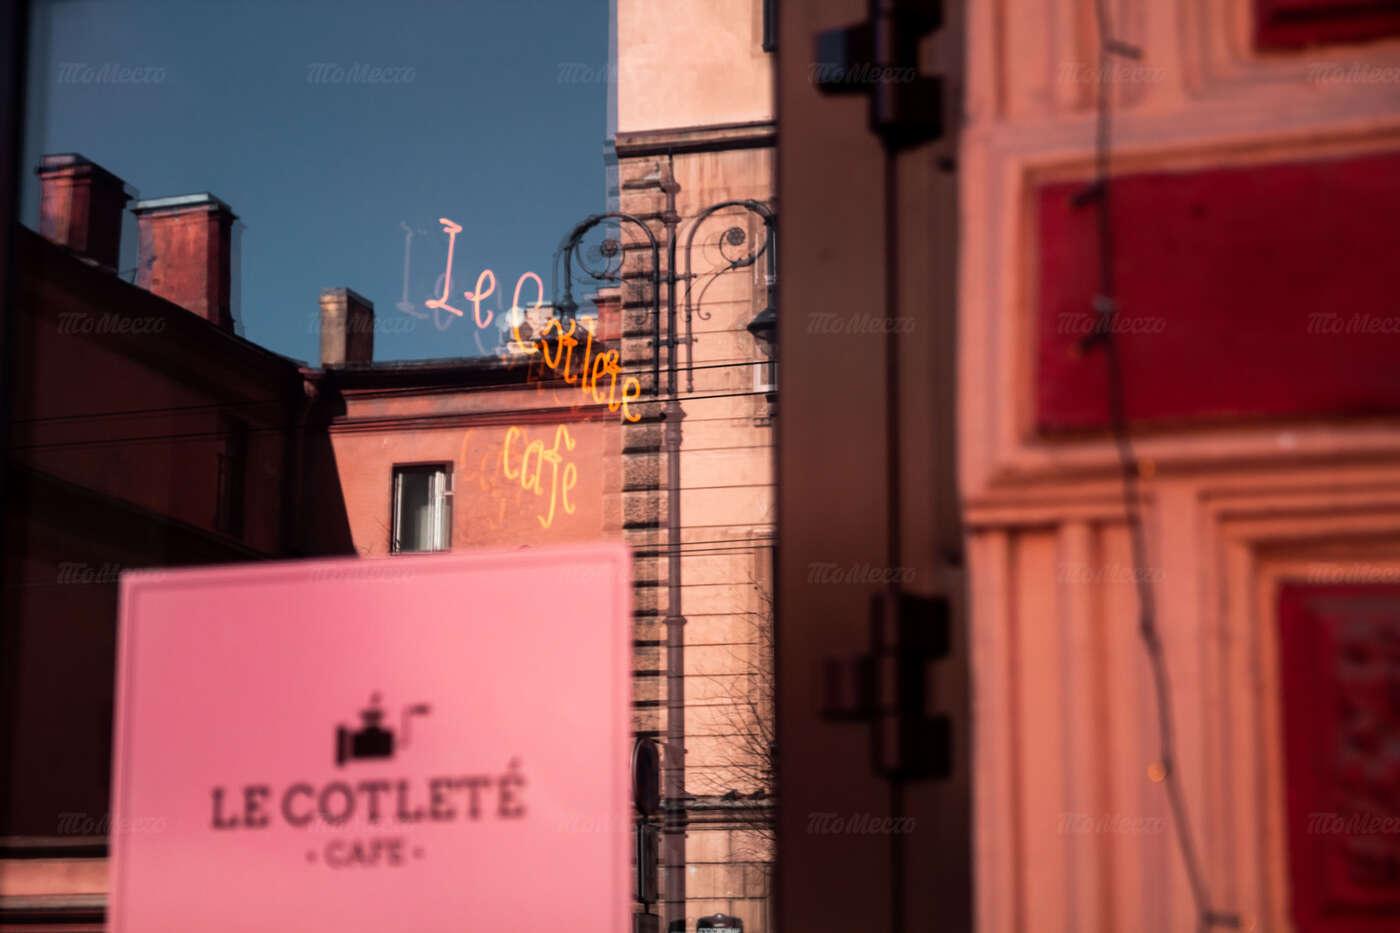 Кафе Le Cotlete Cafe на Чайковского фото 15